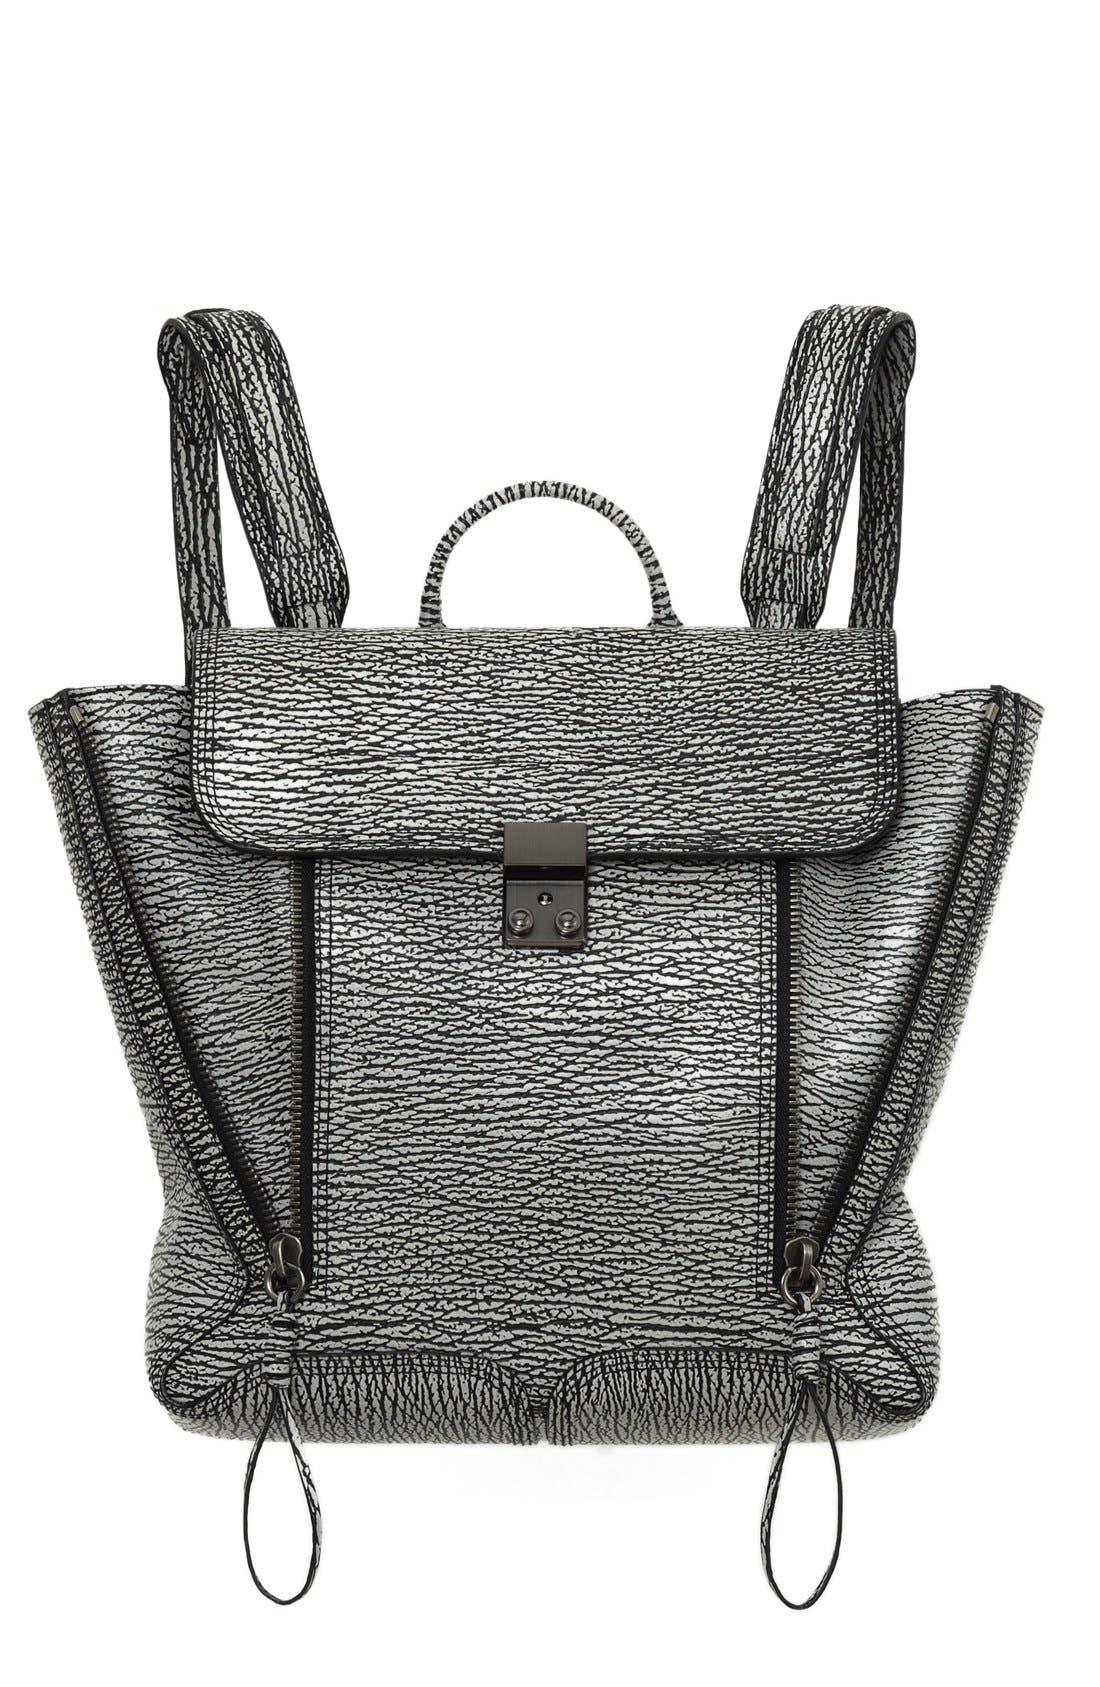 Alternate Image 1 Selected - 3.1 Phillip Lim 'Pashli' Shark Embossed Leather Backpack